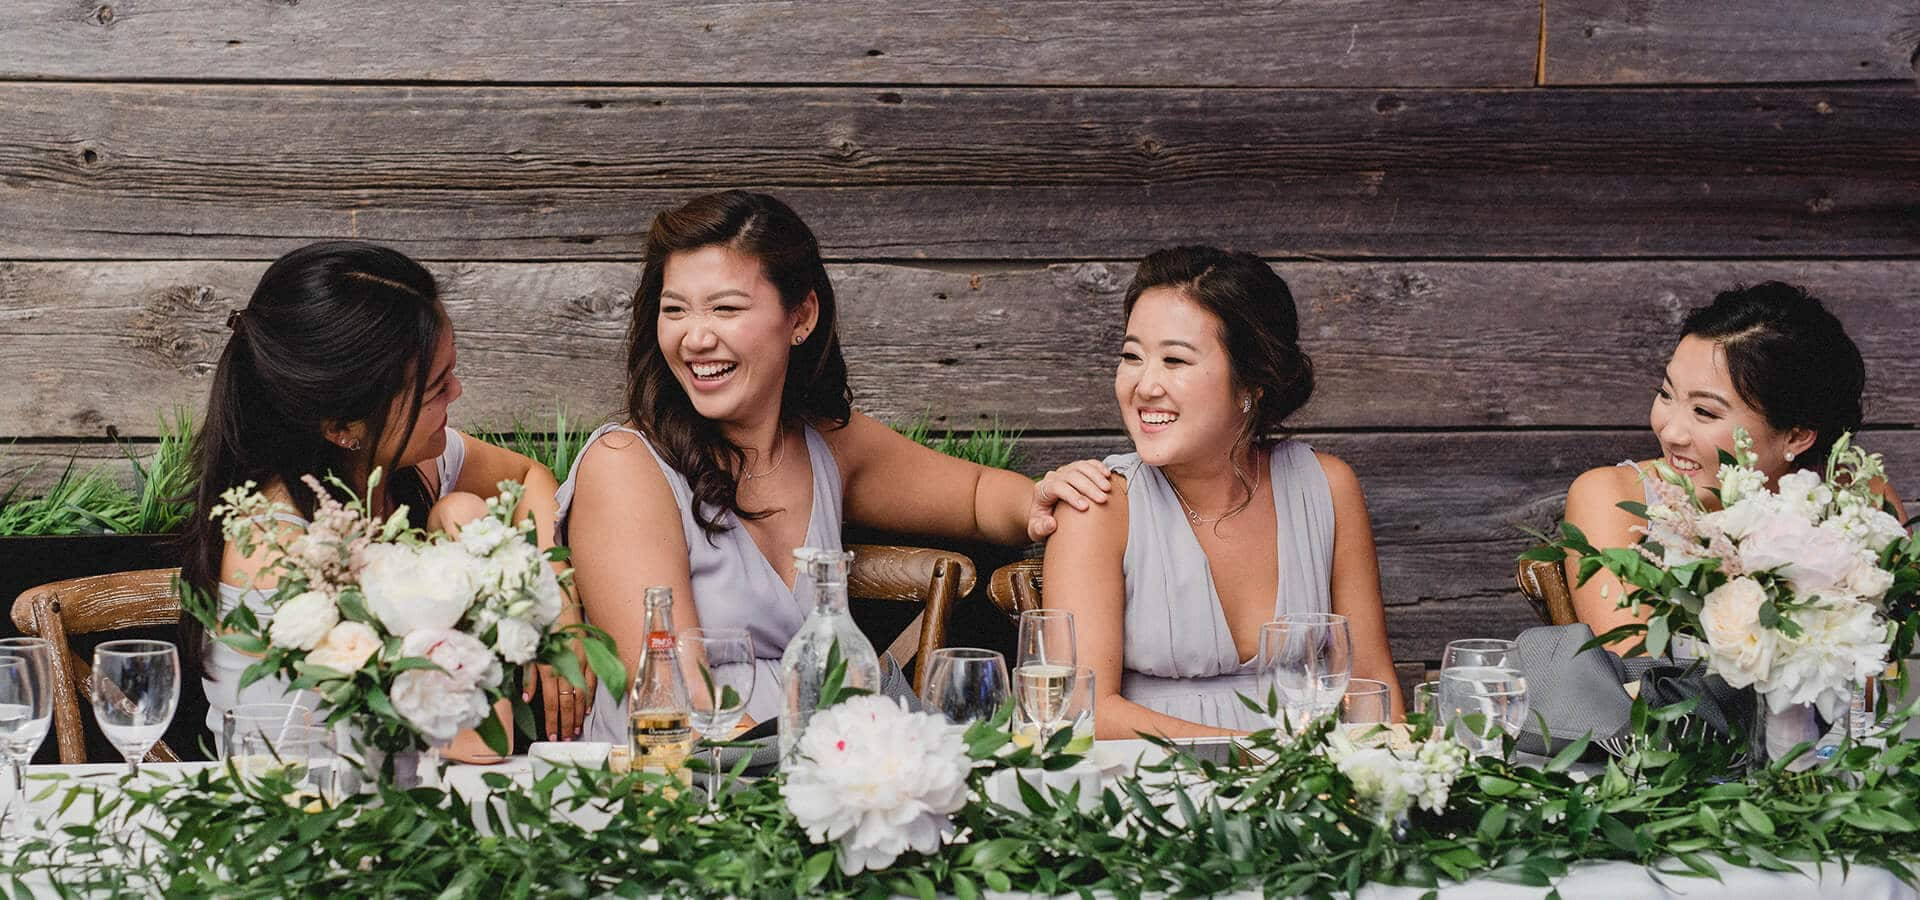 Hero image for A Great Wedding Planning Debate: Open Bar vs. Cash Bar